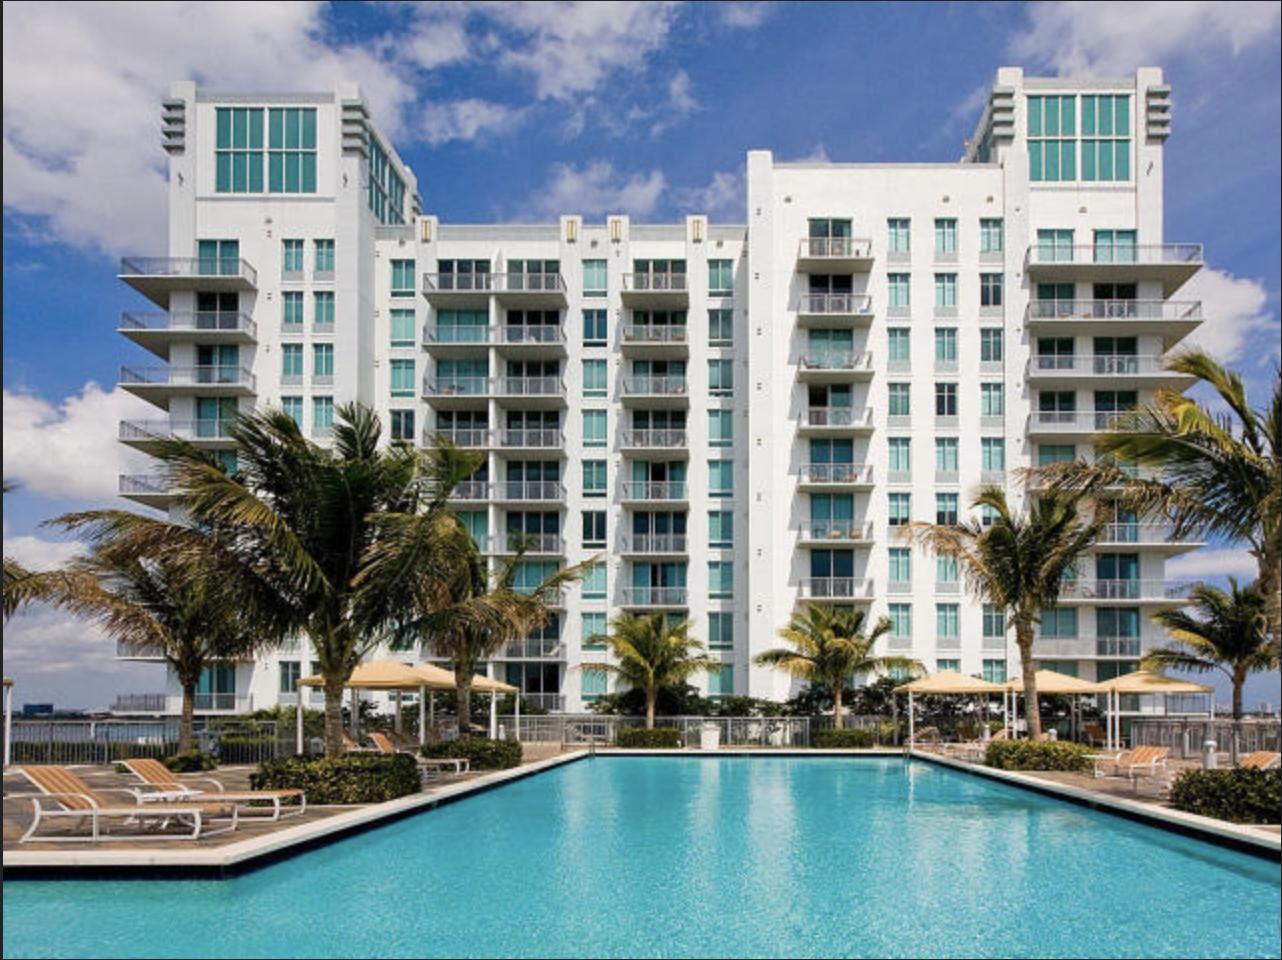 300 S Australian Avenue #819, West Palm Beach, FL 33401 - #: RX-10644538